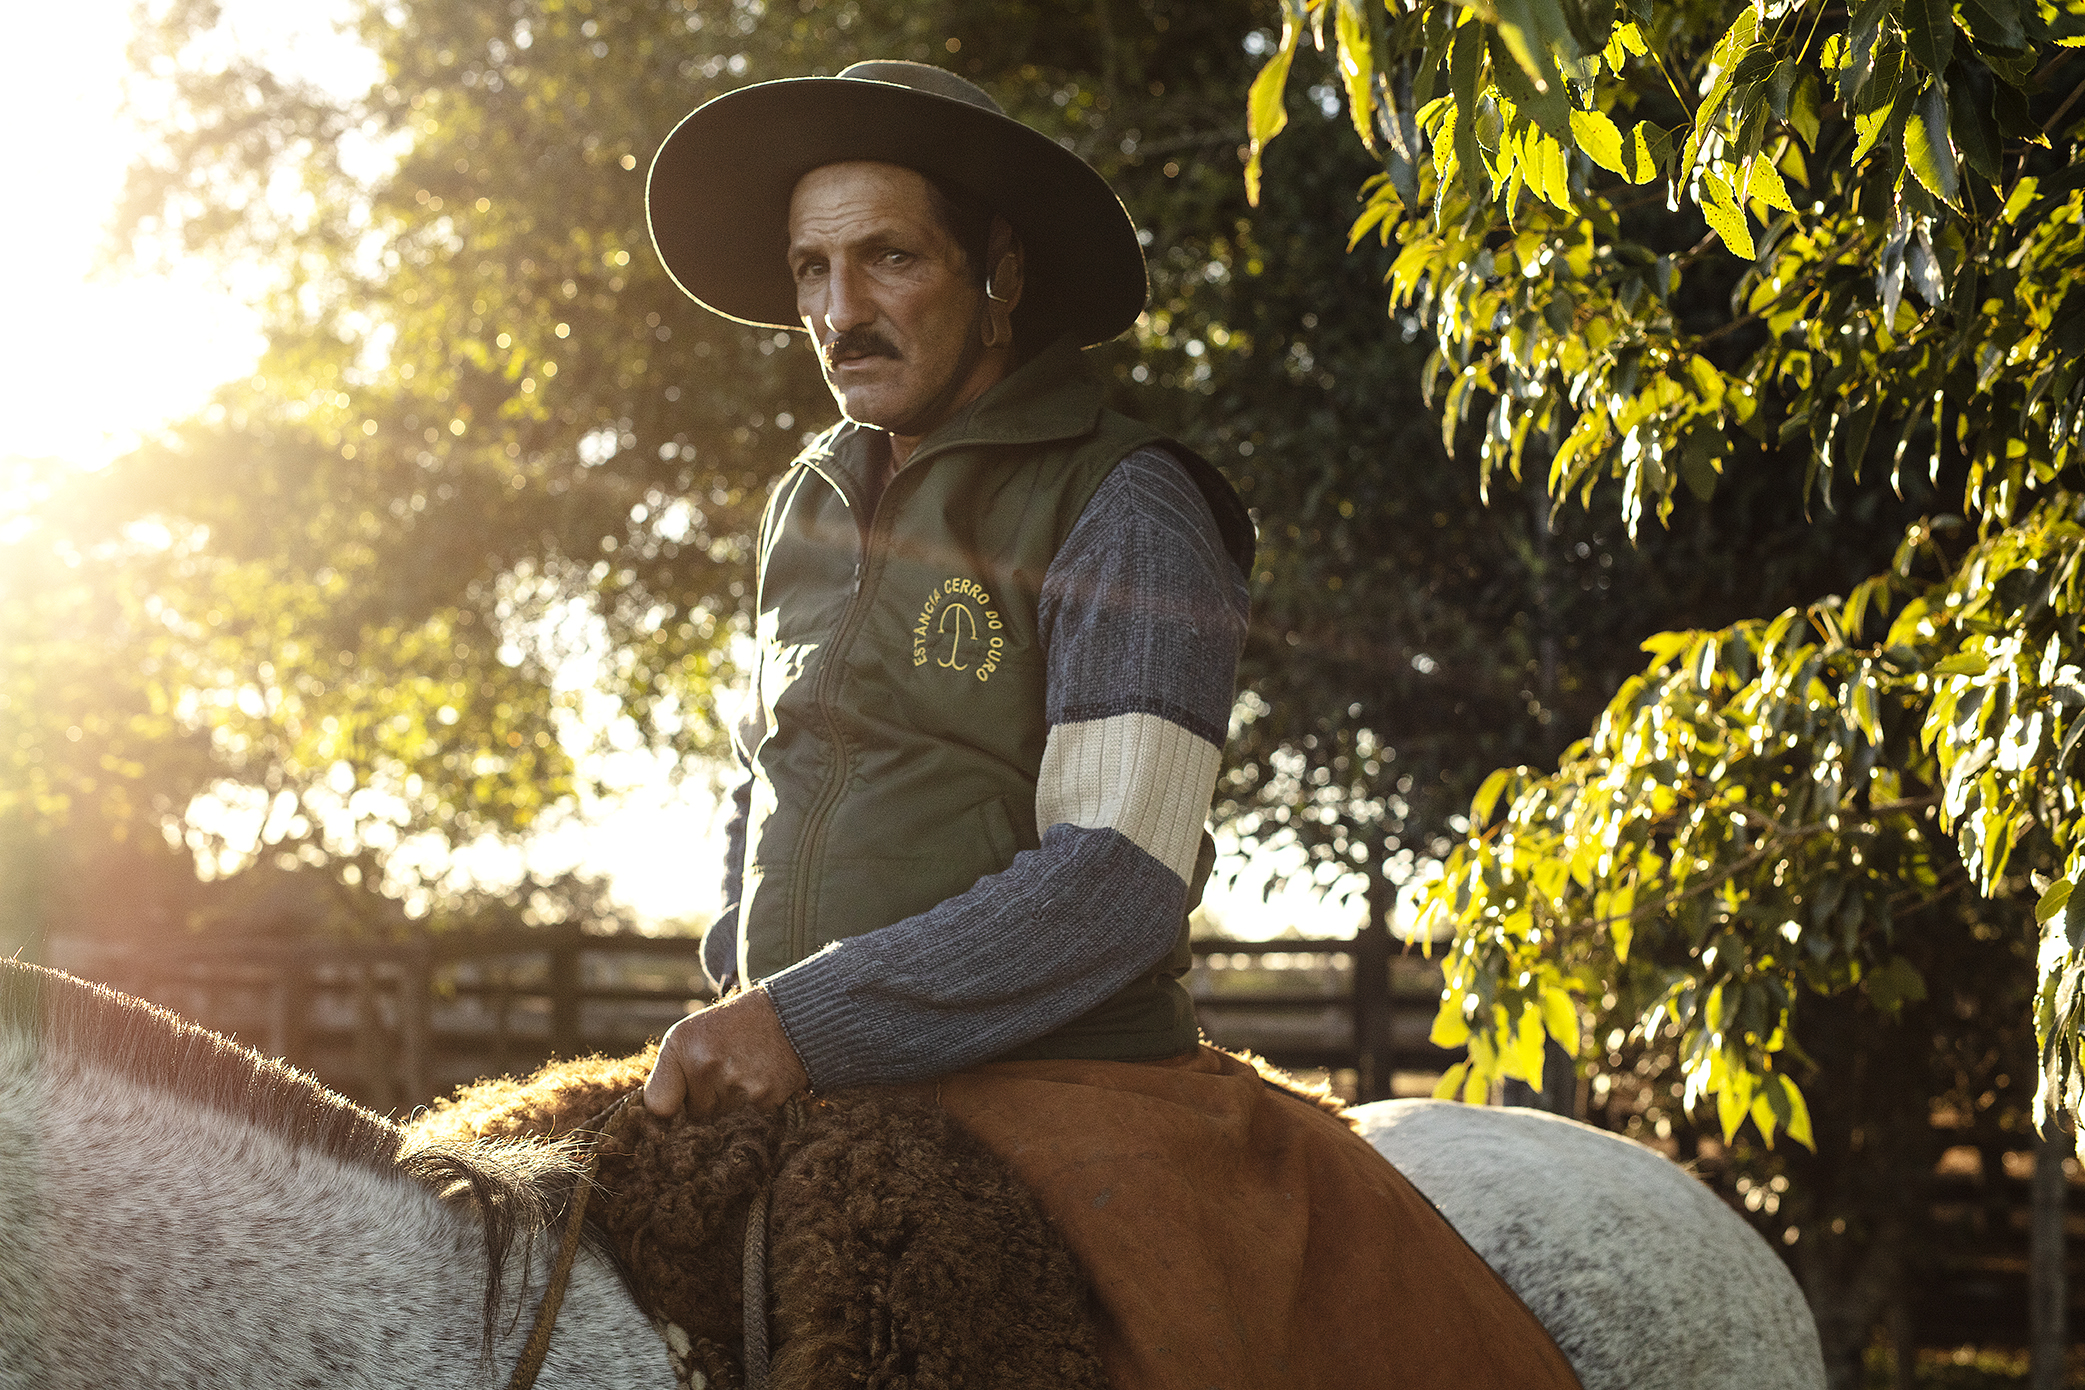 190417NH_brazil_maritza_farm_day1_0054.jpg